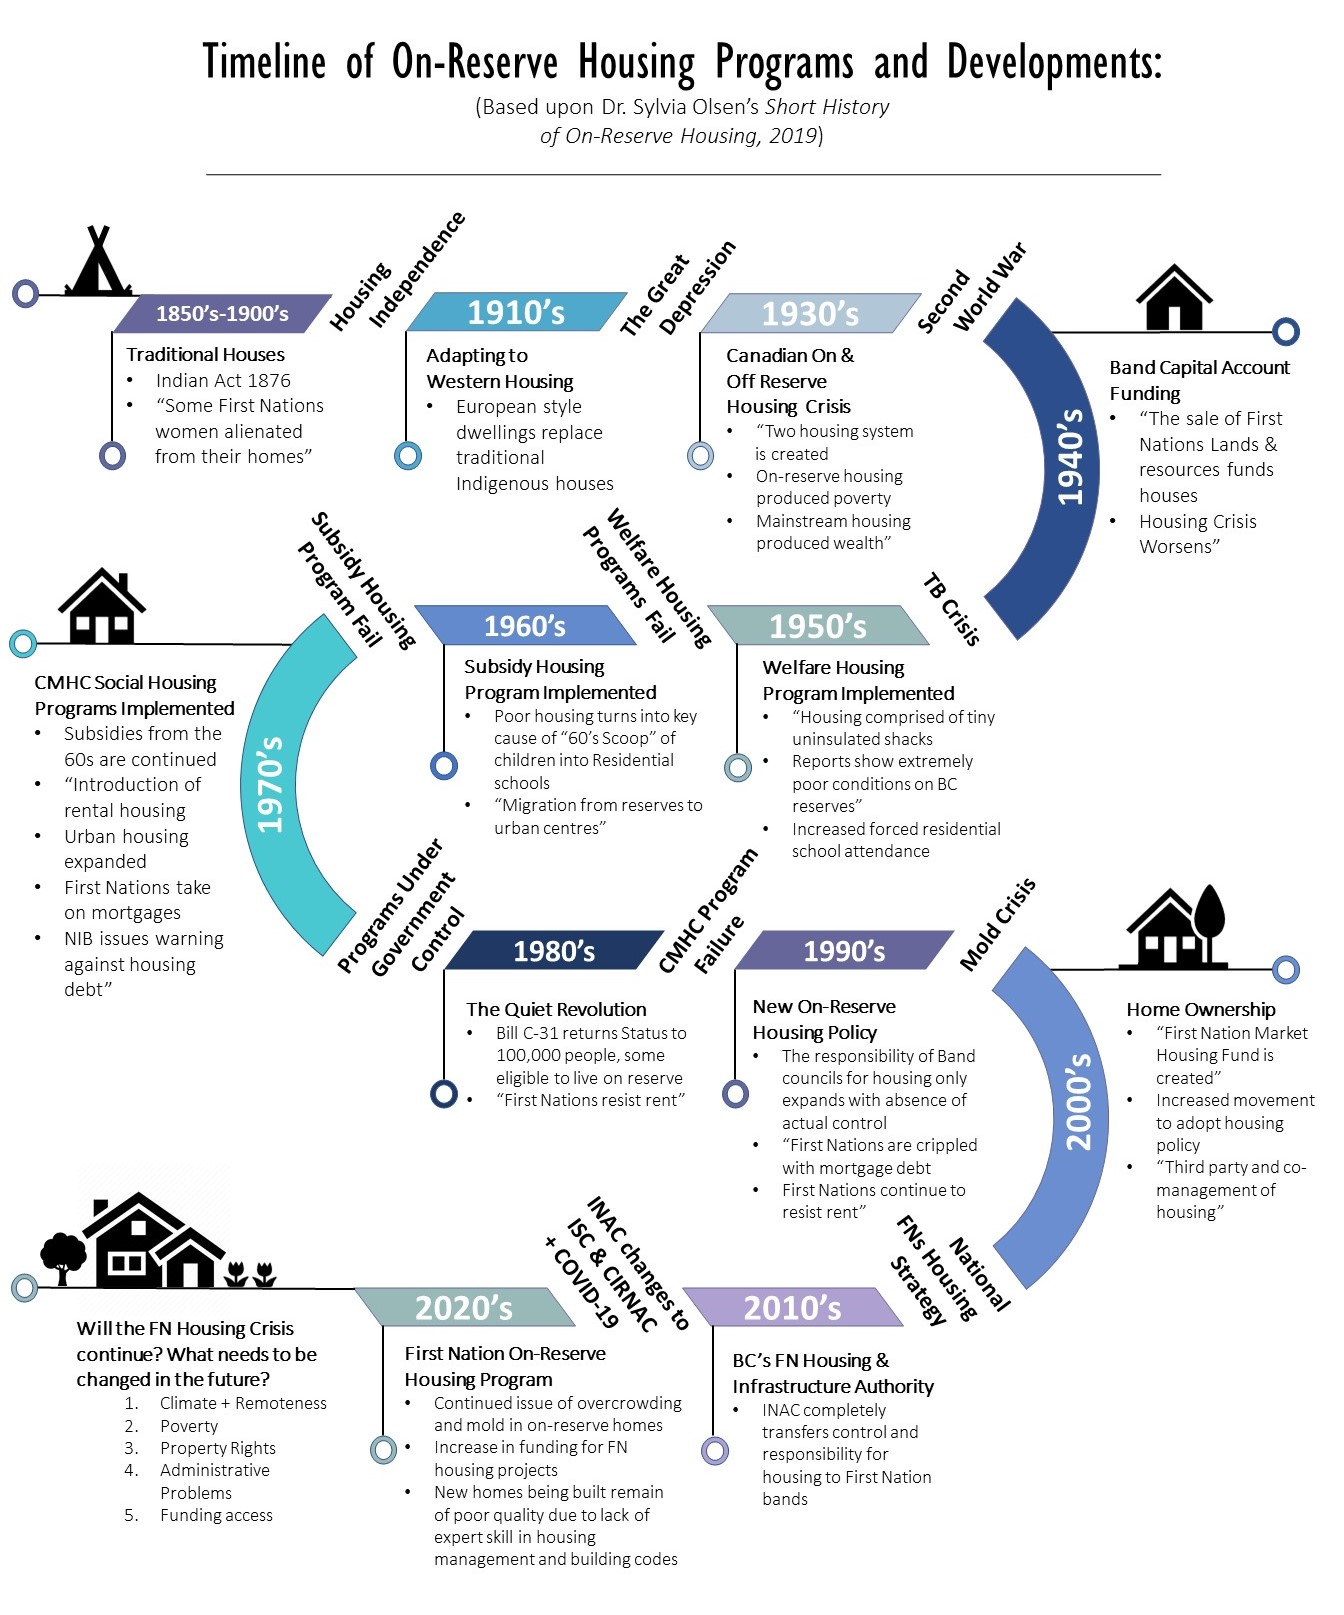 Timeline of On-Reserve Housing Programs and Developments: (Based upon Dr. Sylvia Olsen's Short History of On-Reserve Housing, 2019)